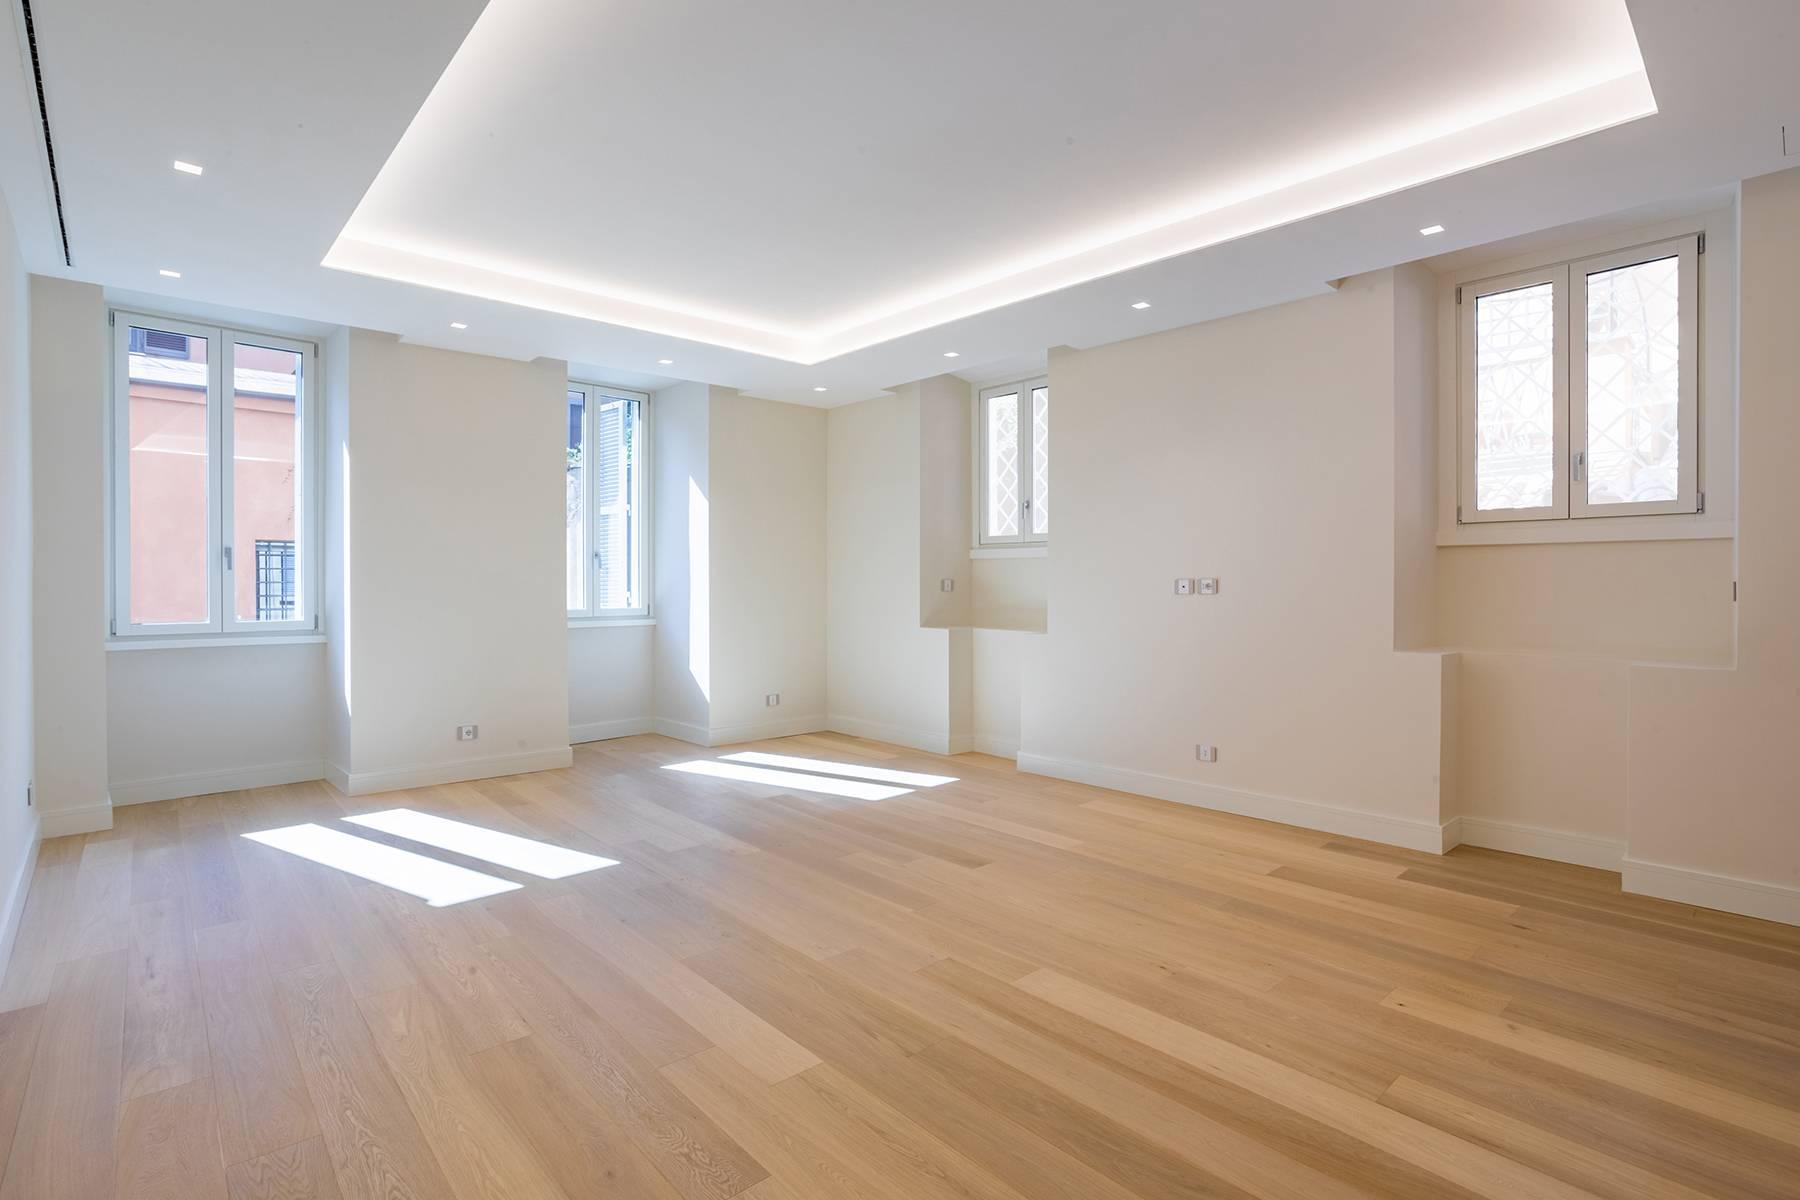 Spanish Steps luxury turnkey apartment - 4